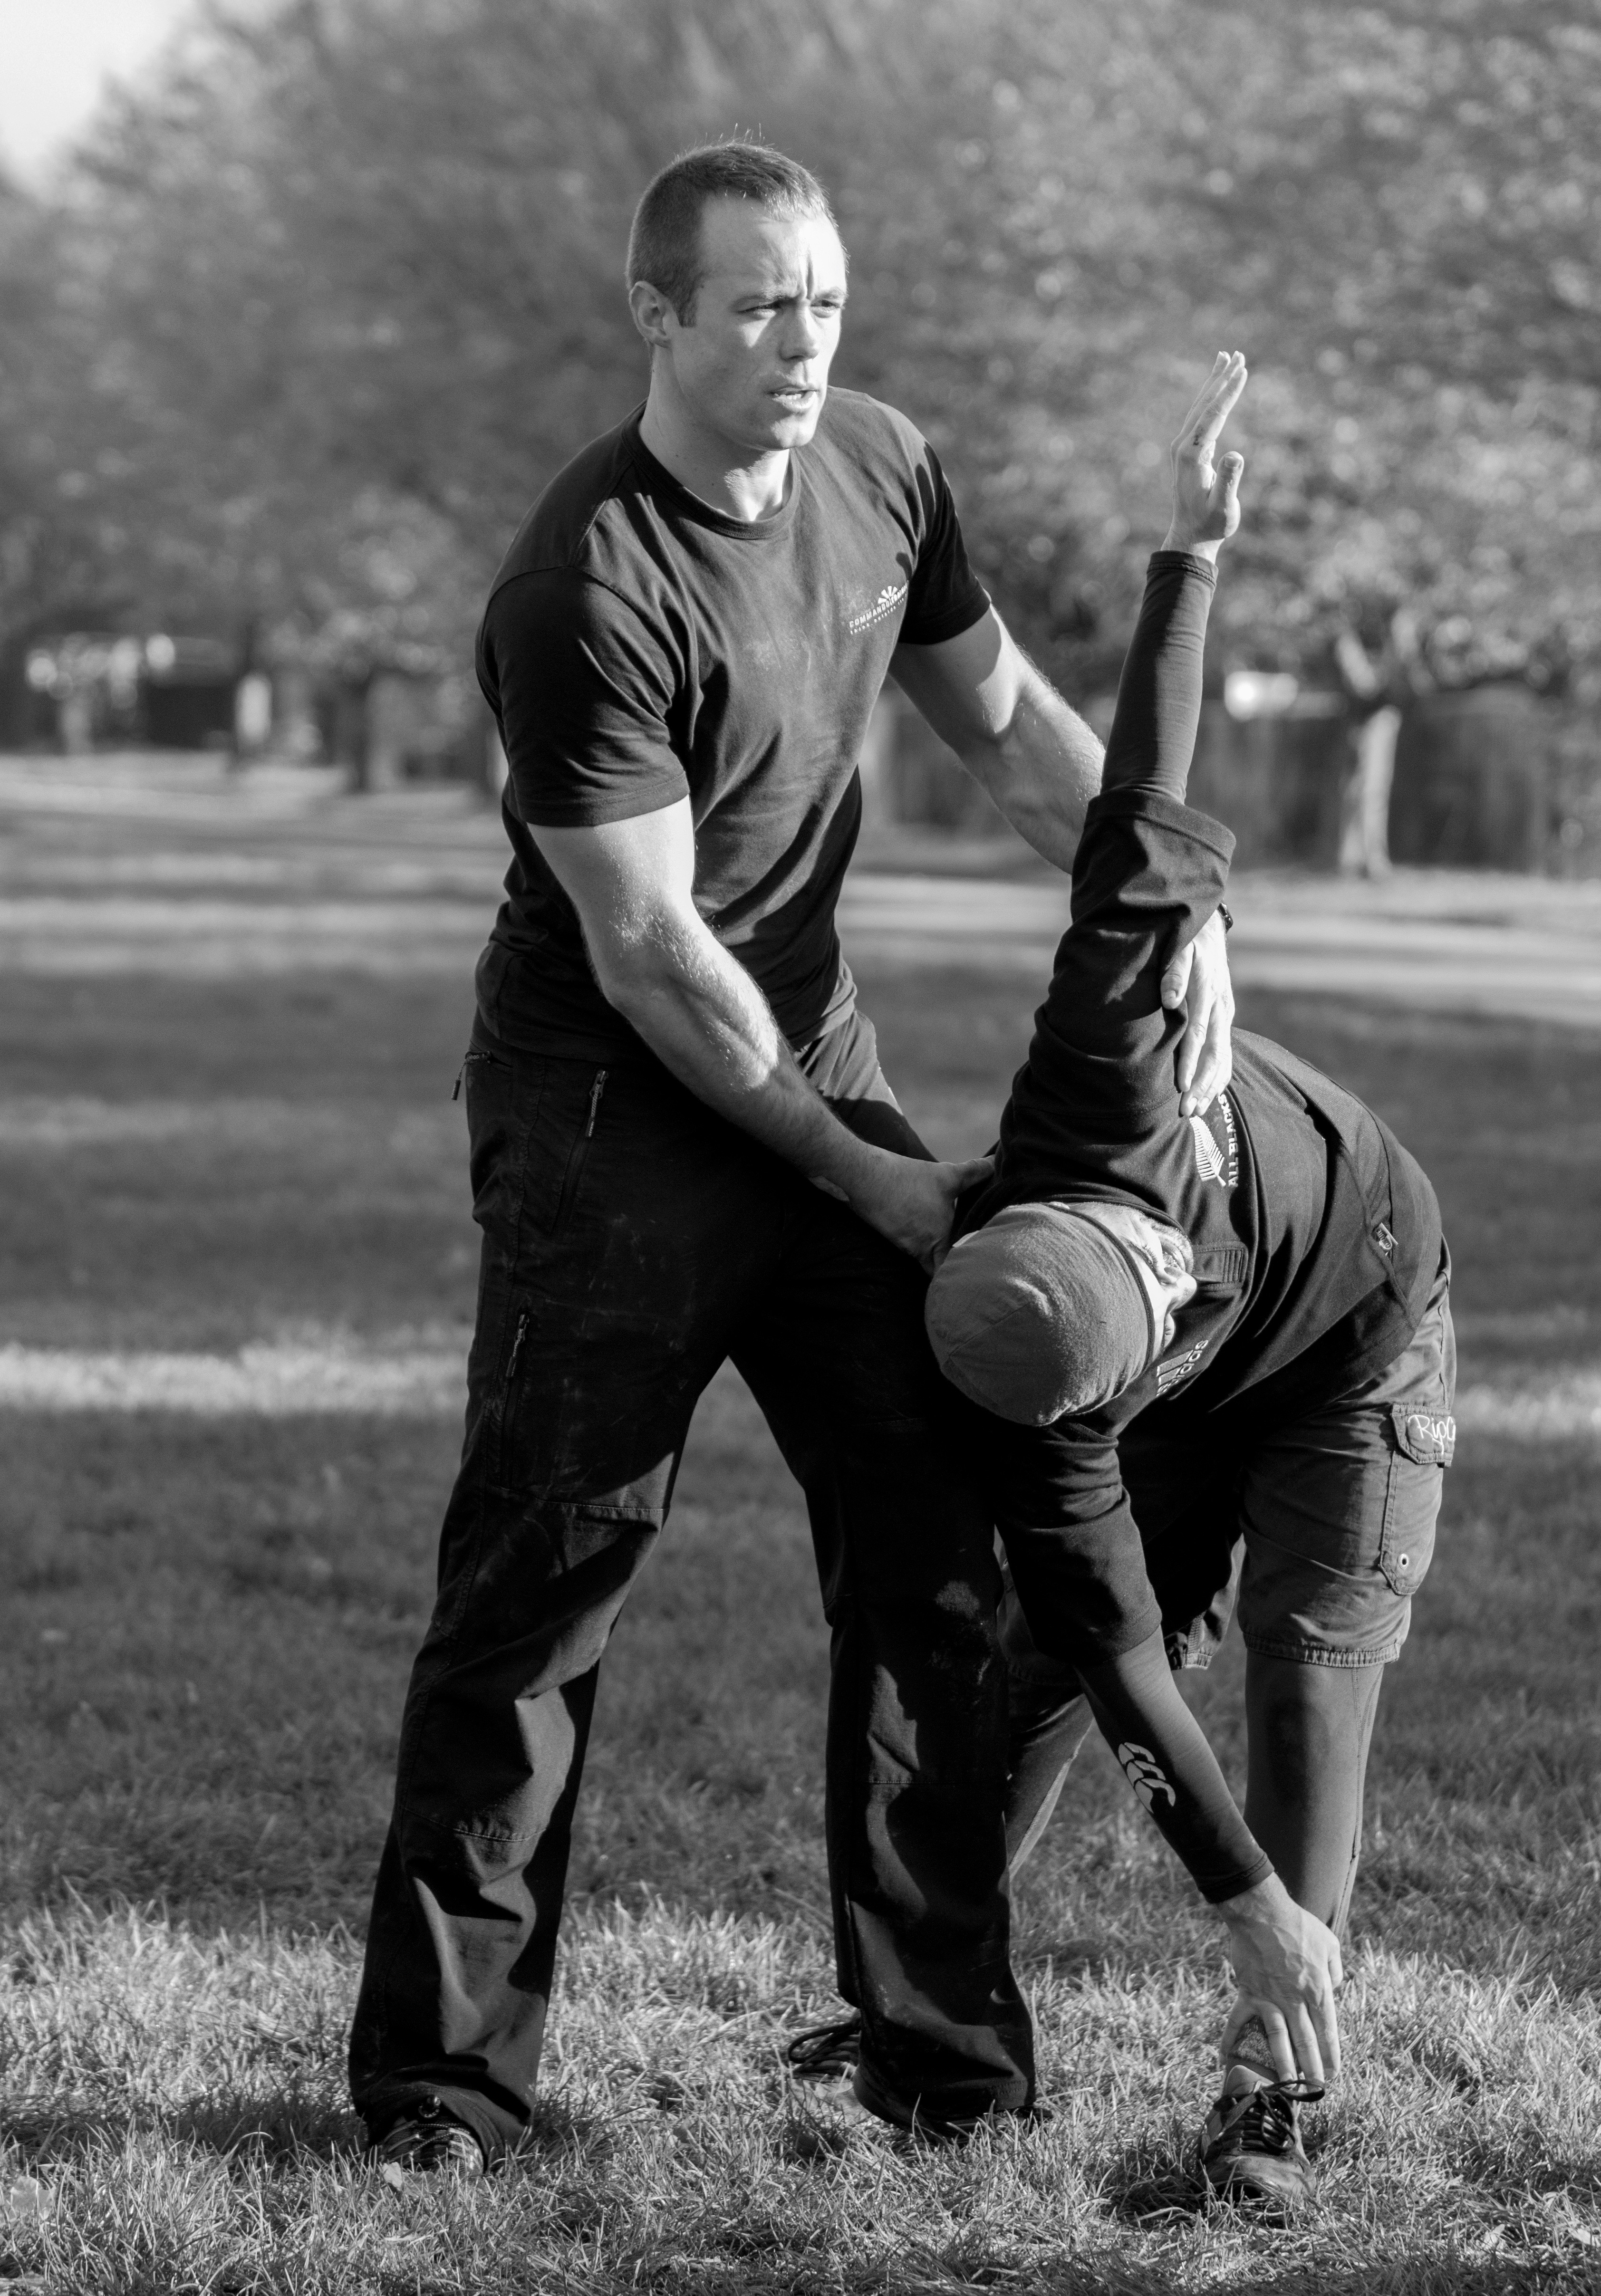 Me stretching Kiwi